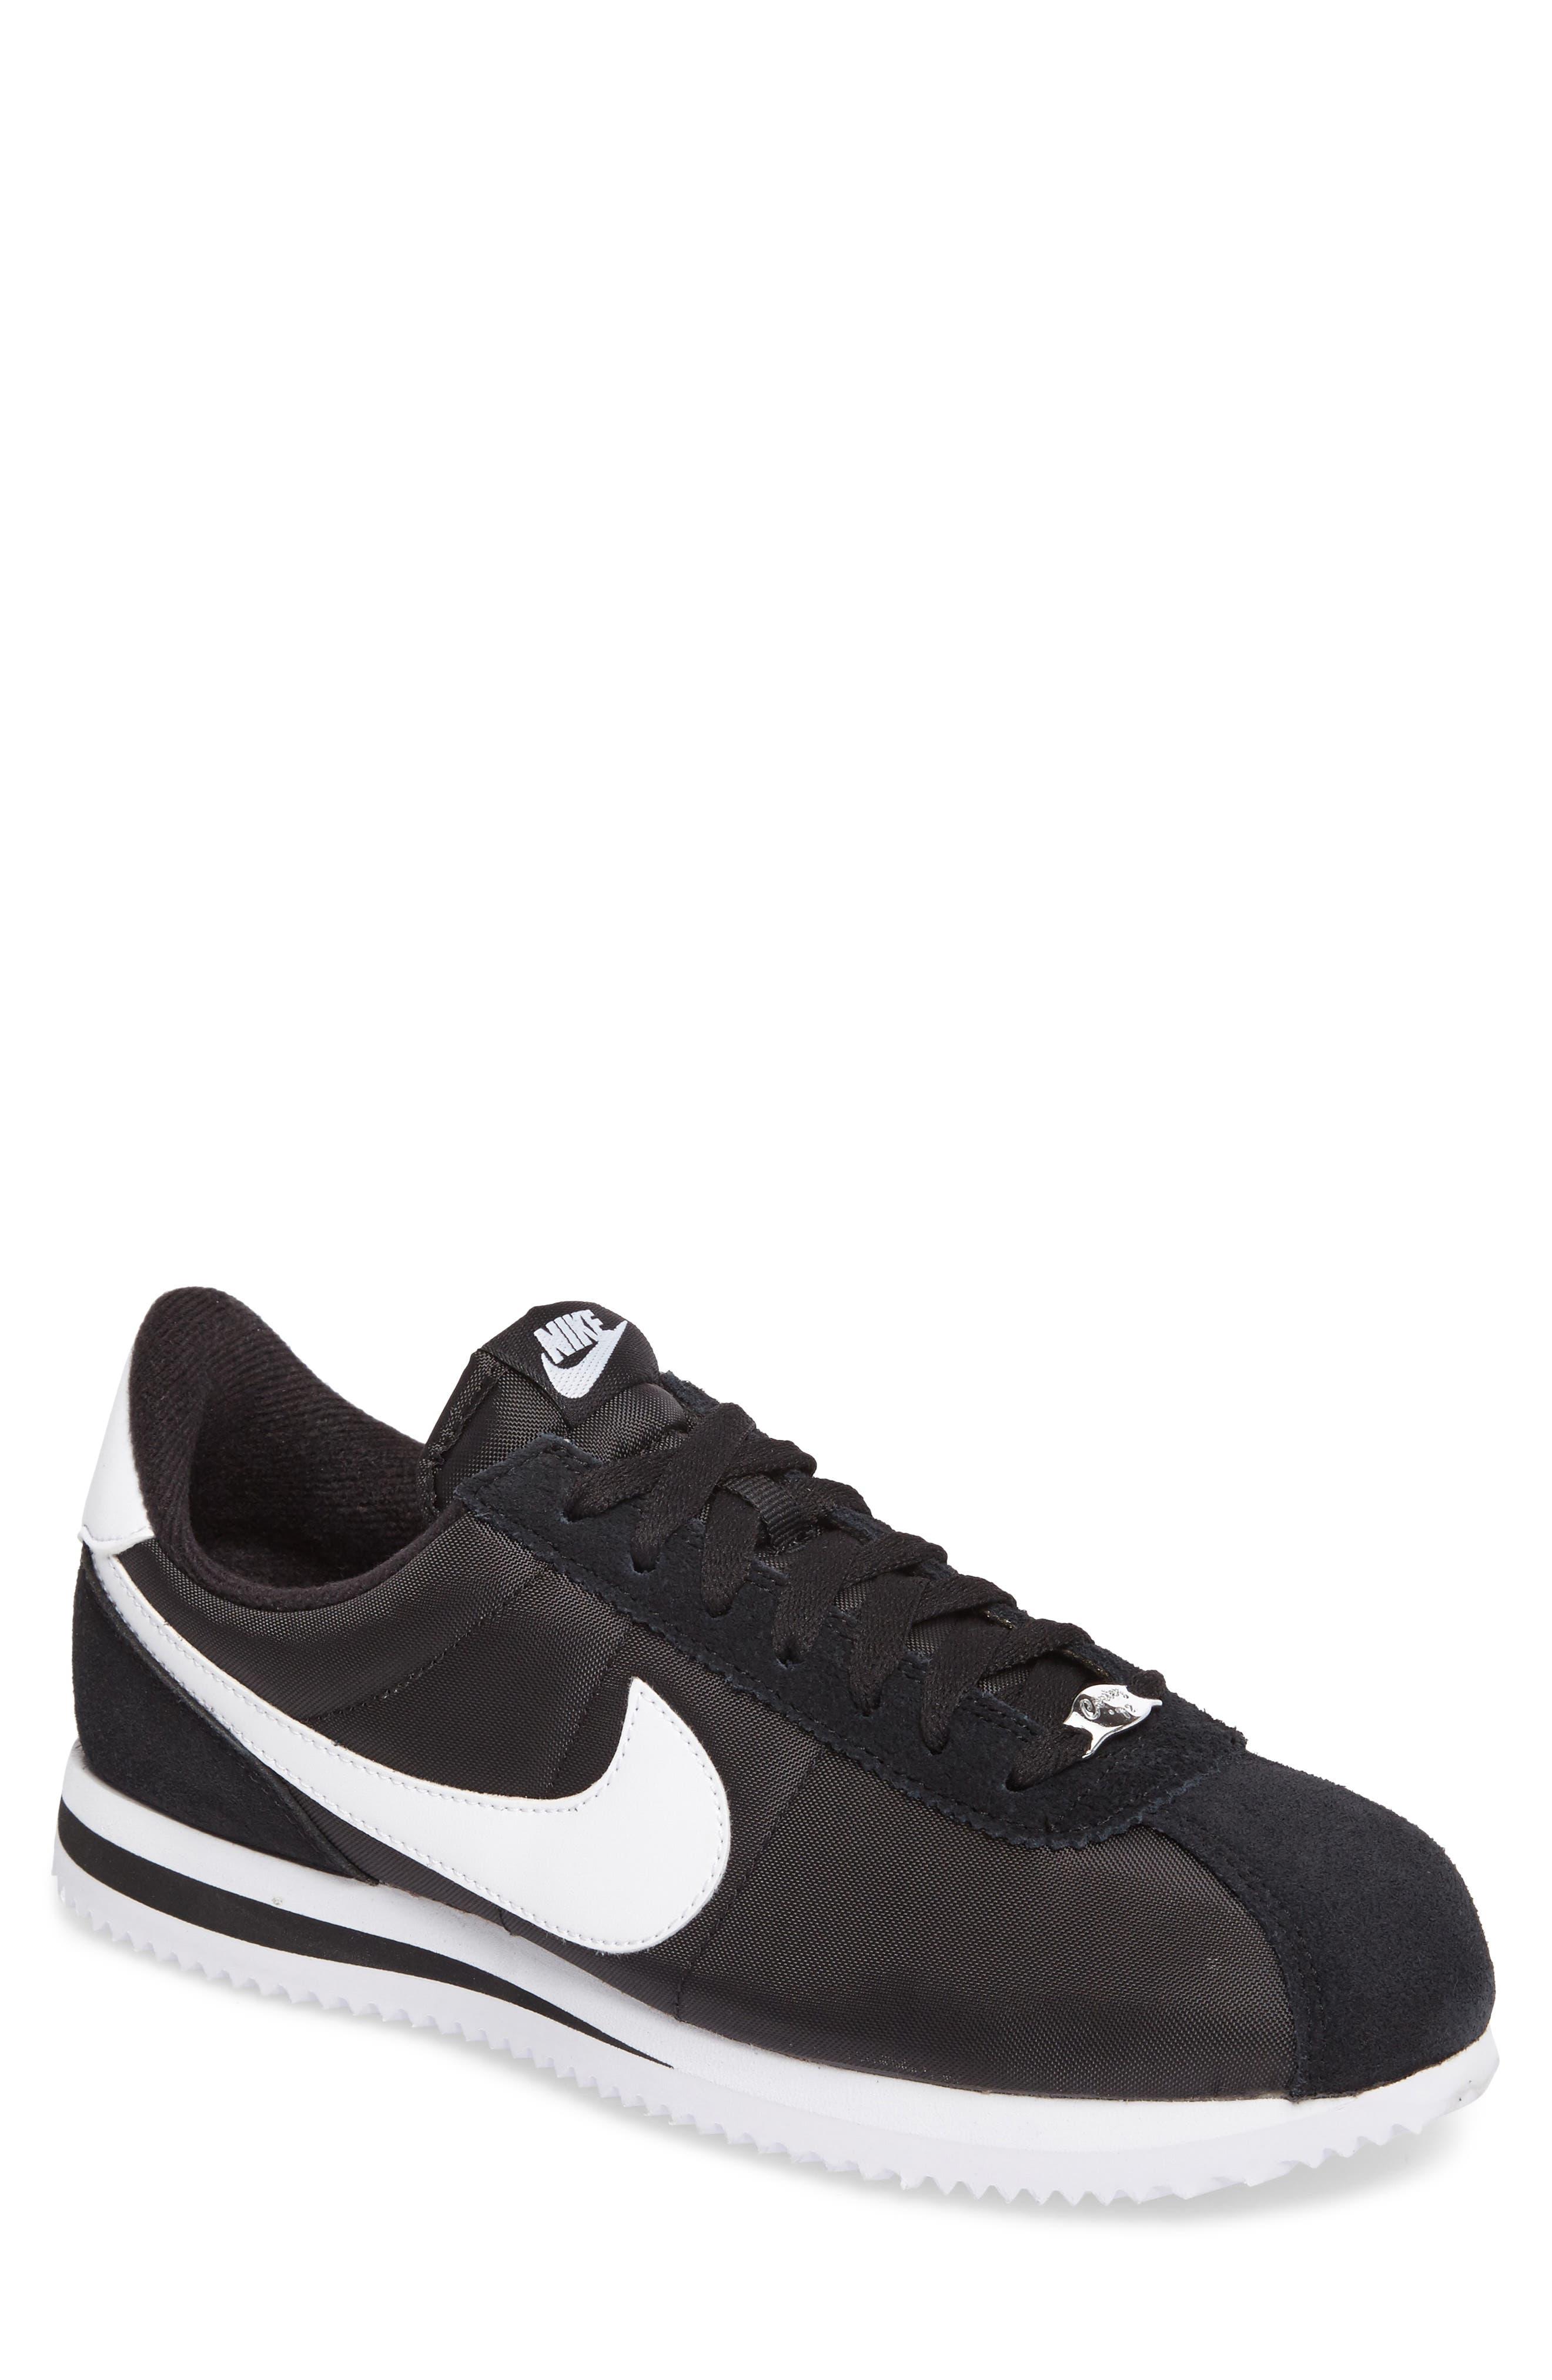 Cortez Basic Nylon Sneaker,                             Main thumbnail 1, color,                             BLACK/WHITE/METALLIC SILVER